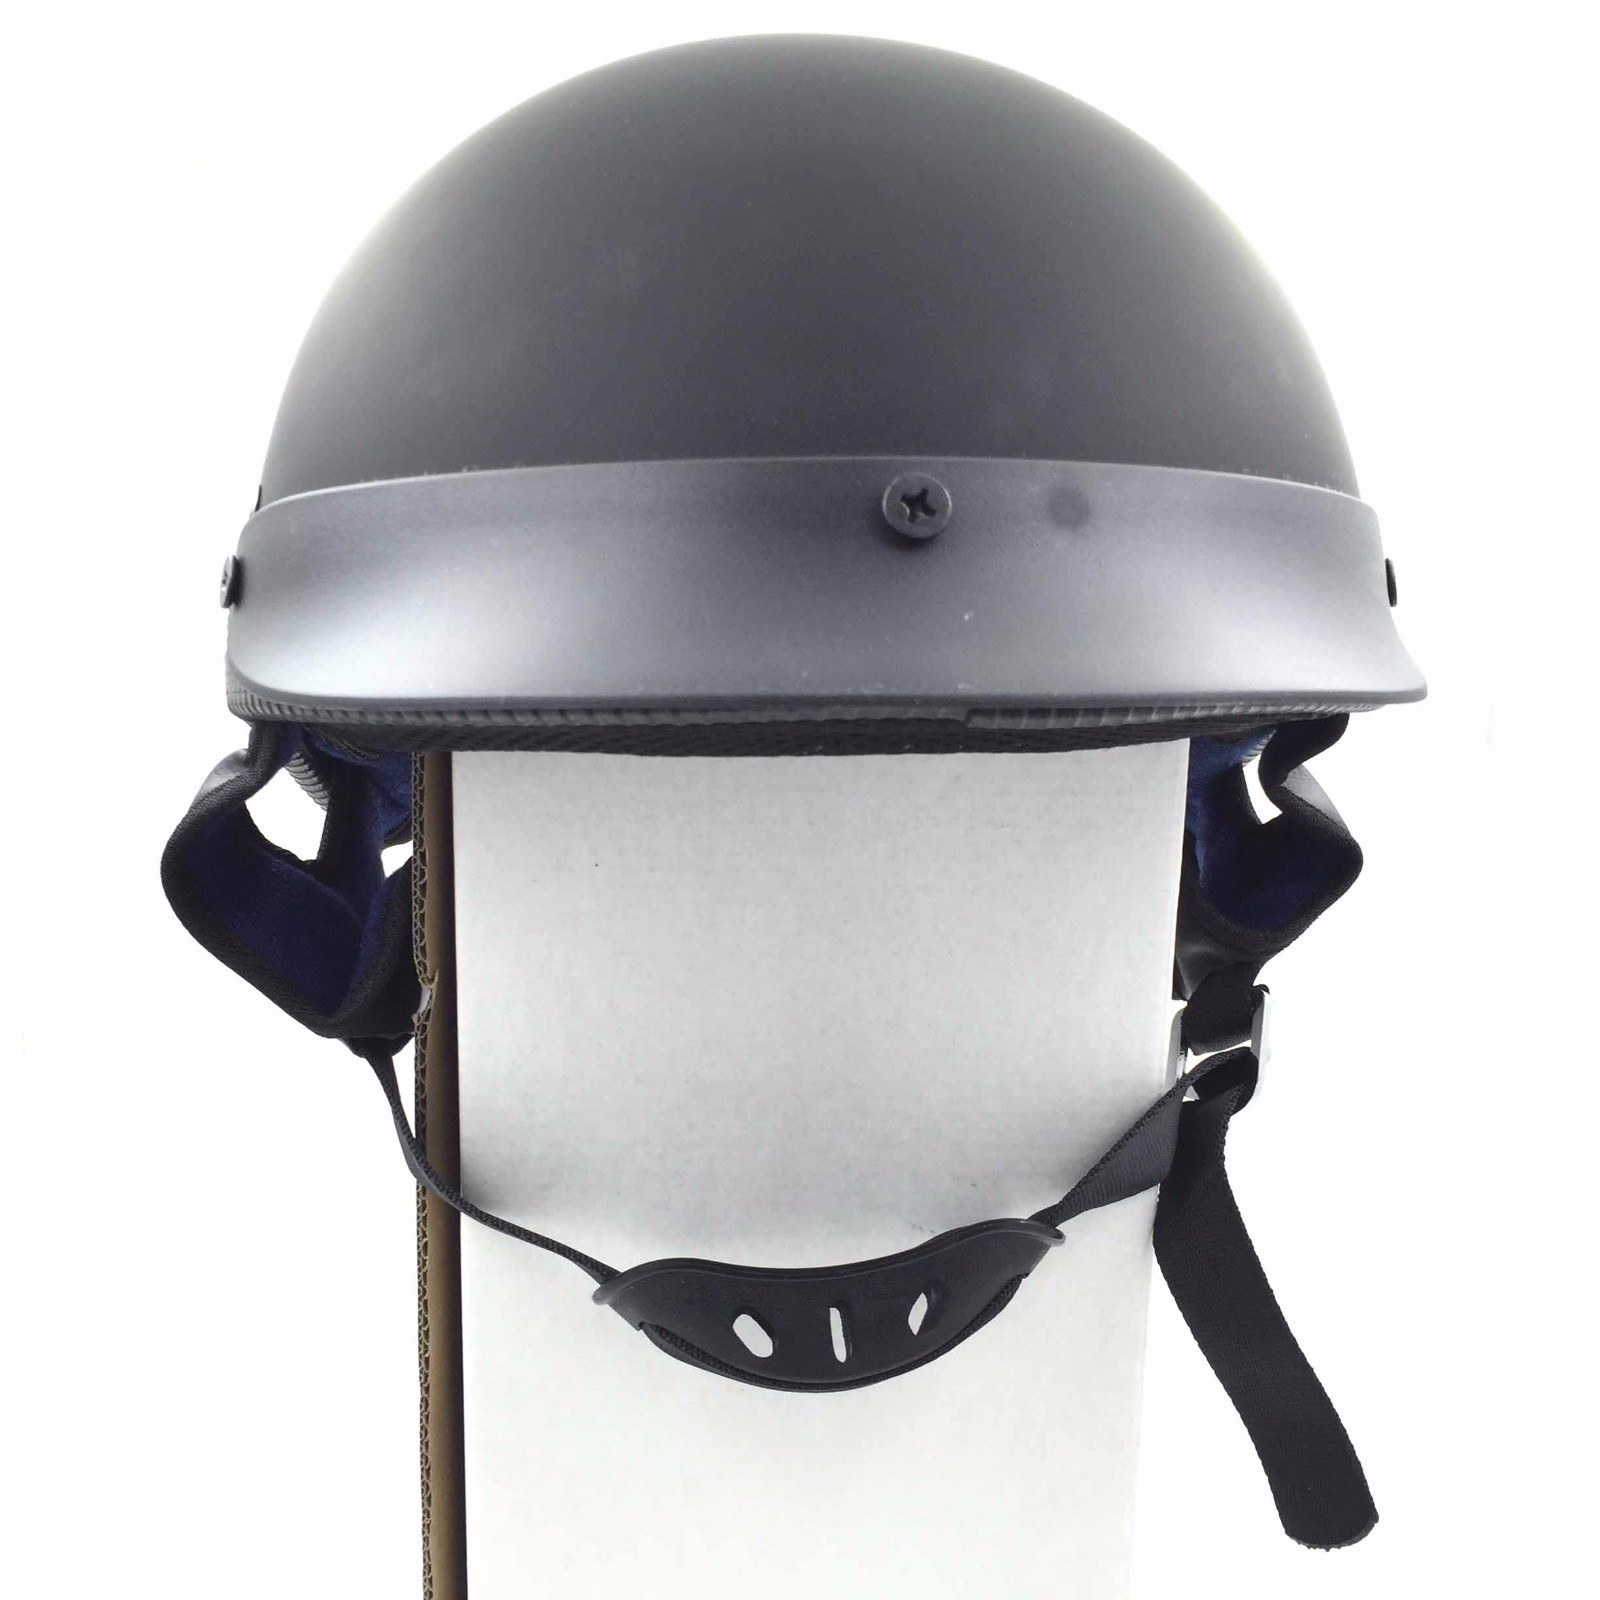 No Scratch Black Harley Davidson Half Helmet Bag 100/% Nylon Water Resistant